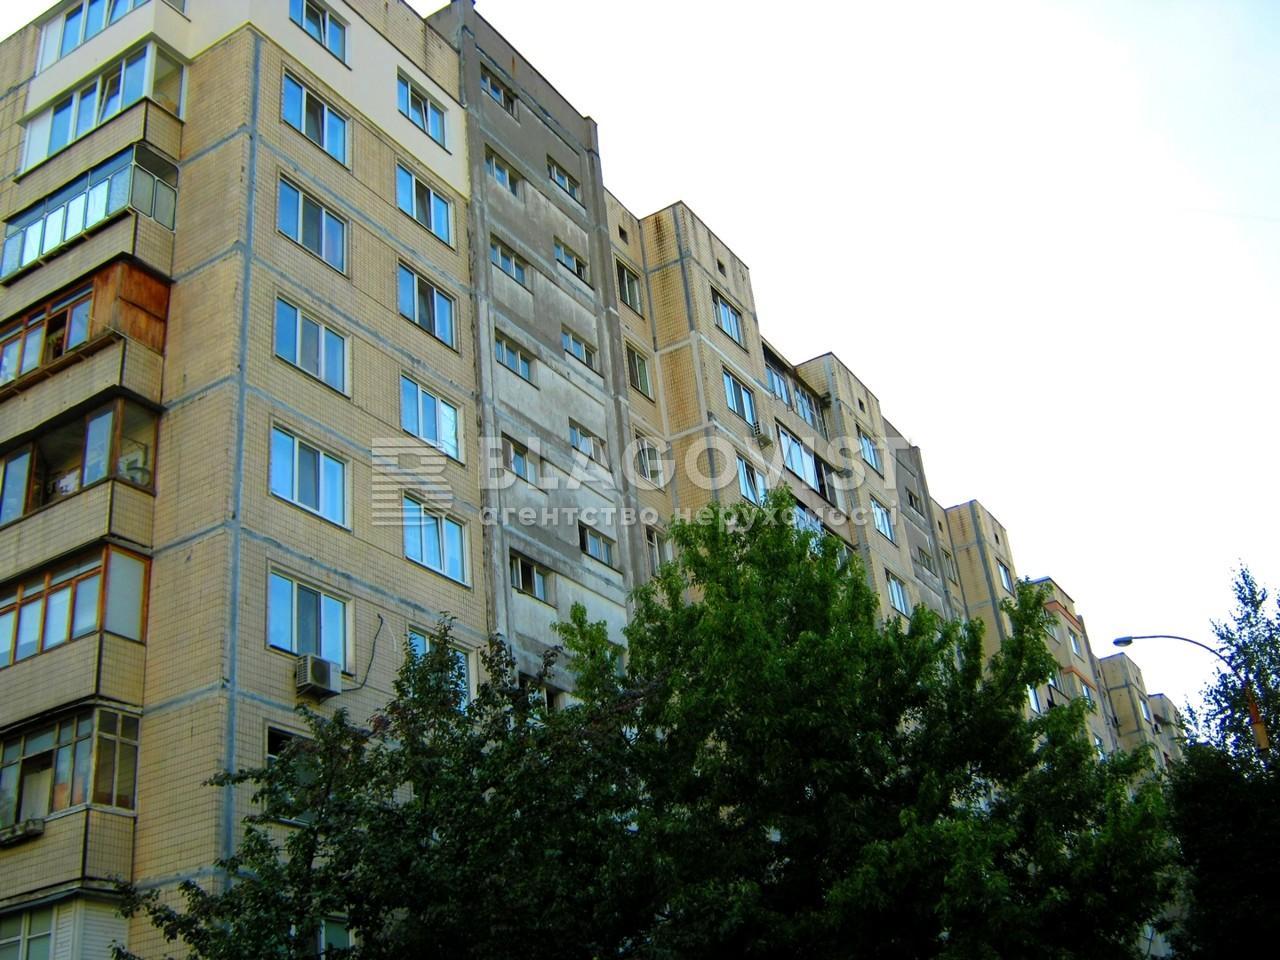 Квартира A-109123, Харківське шосе, 174б, Київ - Фото 4